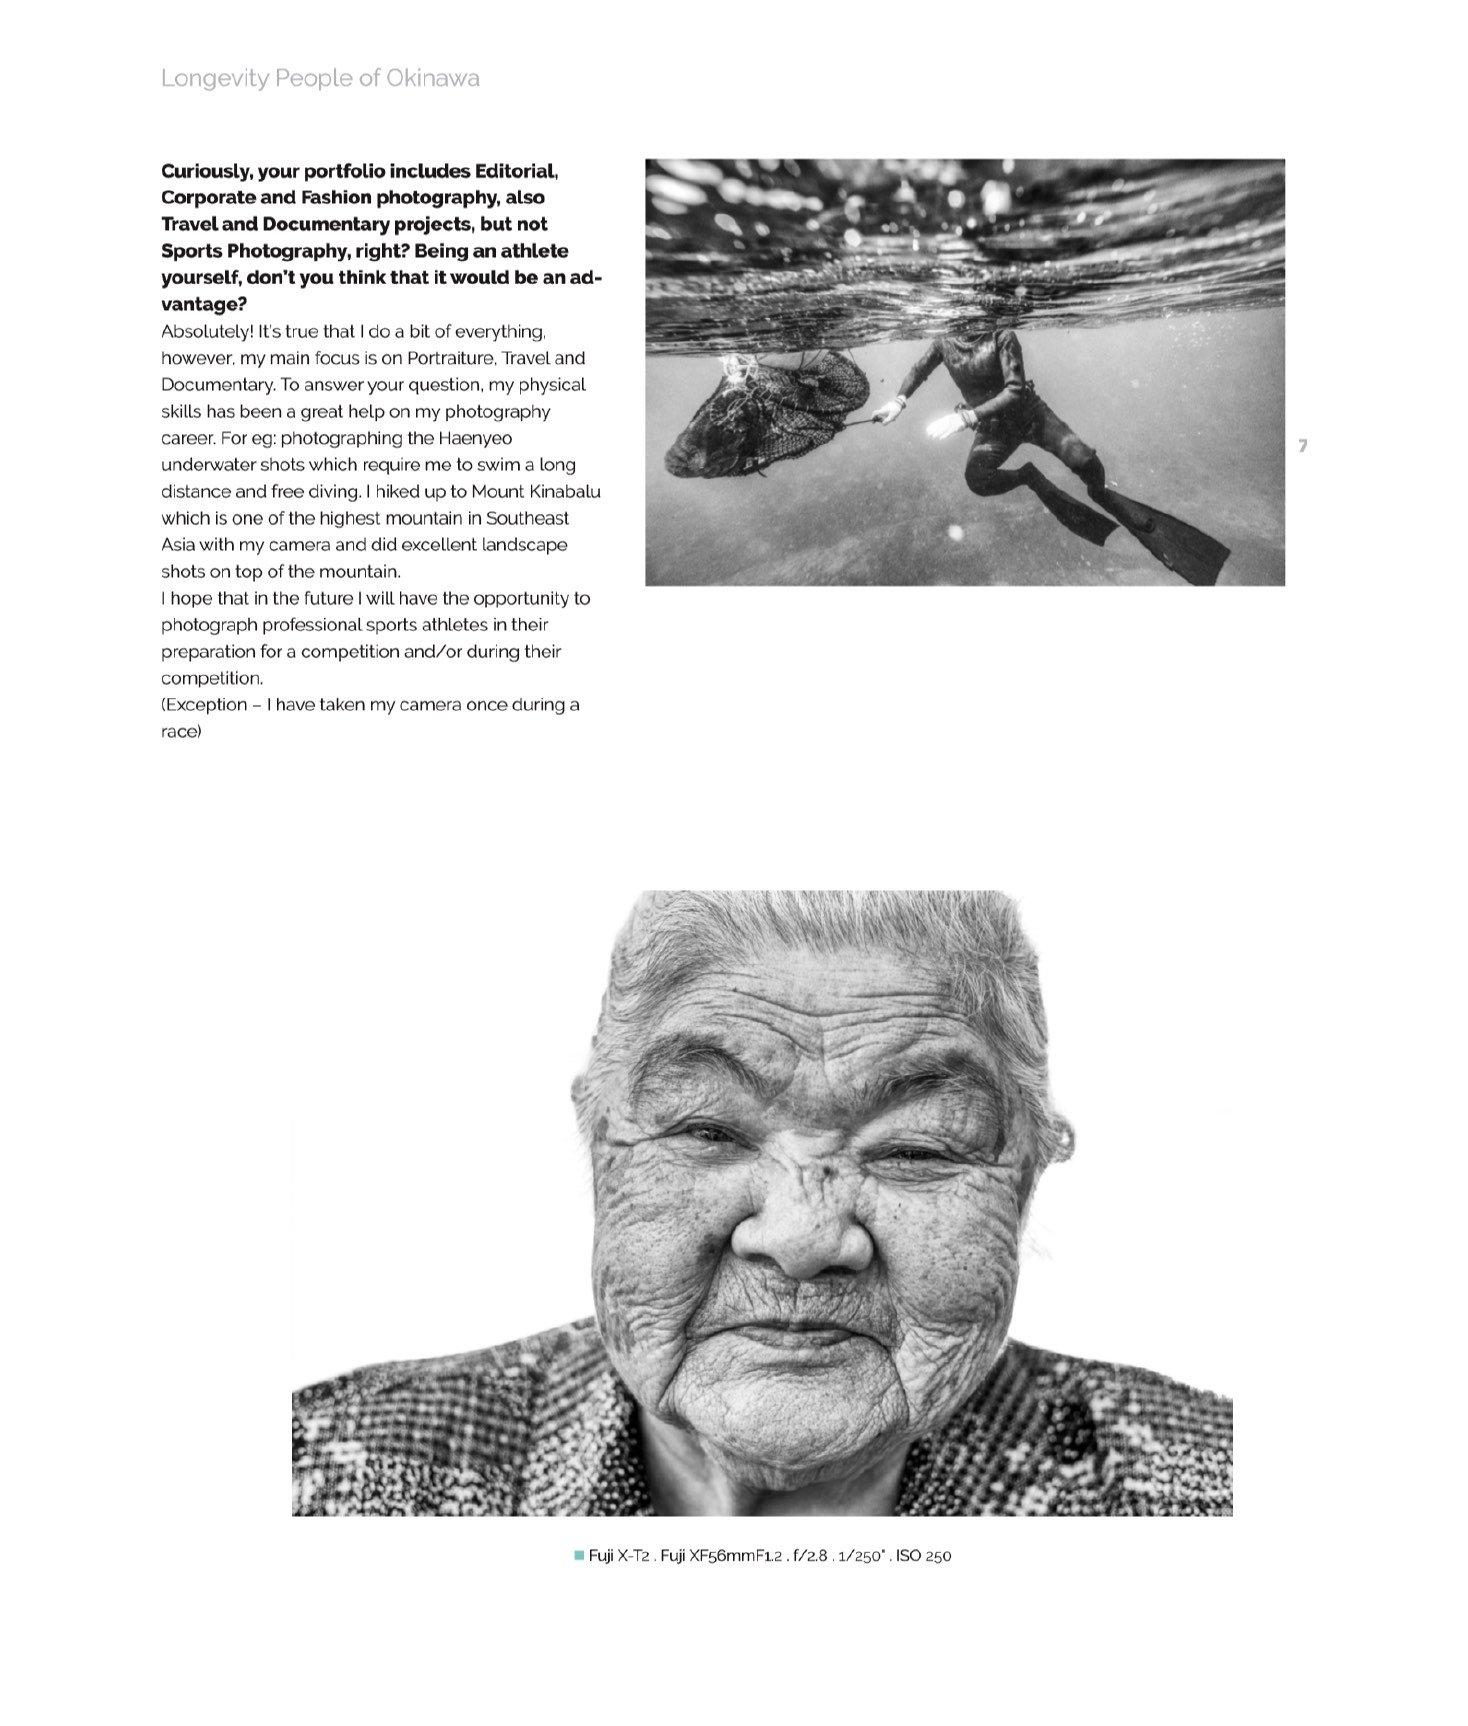 FUJI X Passion Longevity Okinawa Jose Jeuland 4